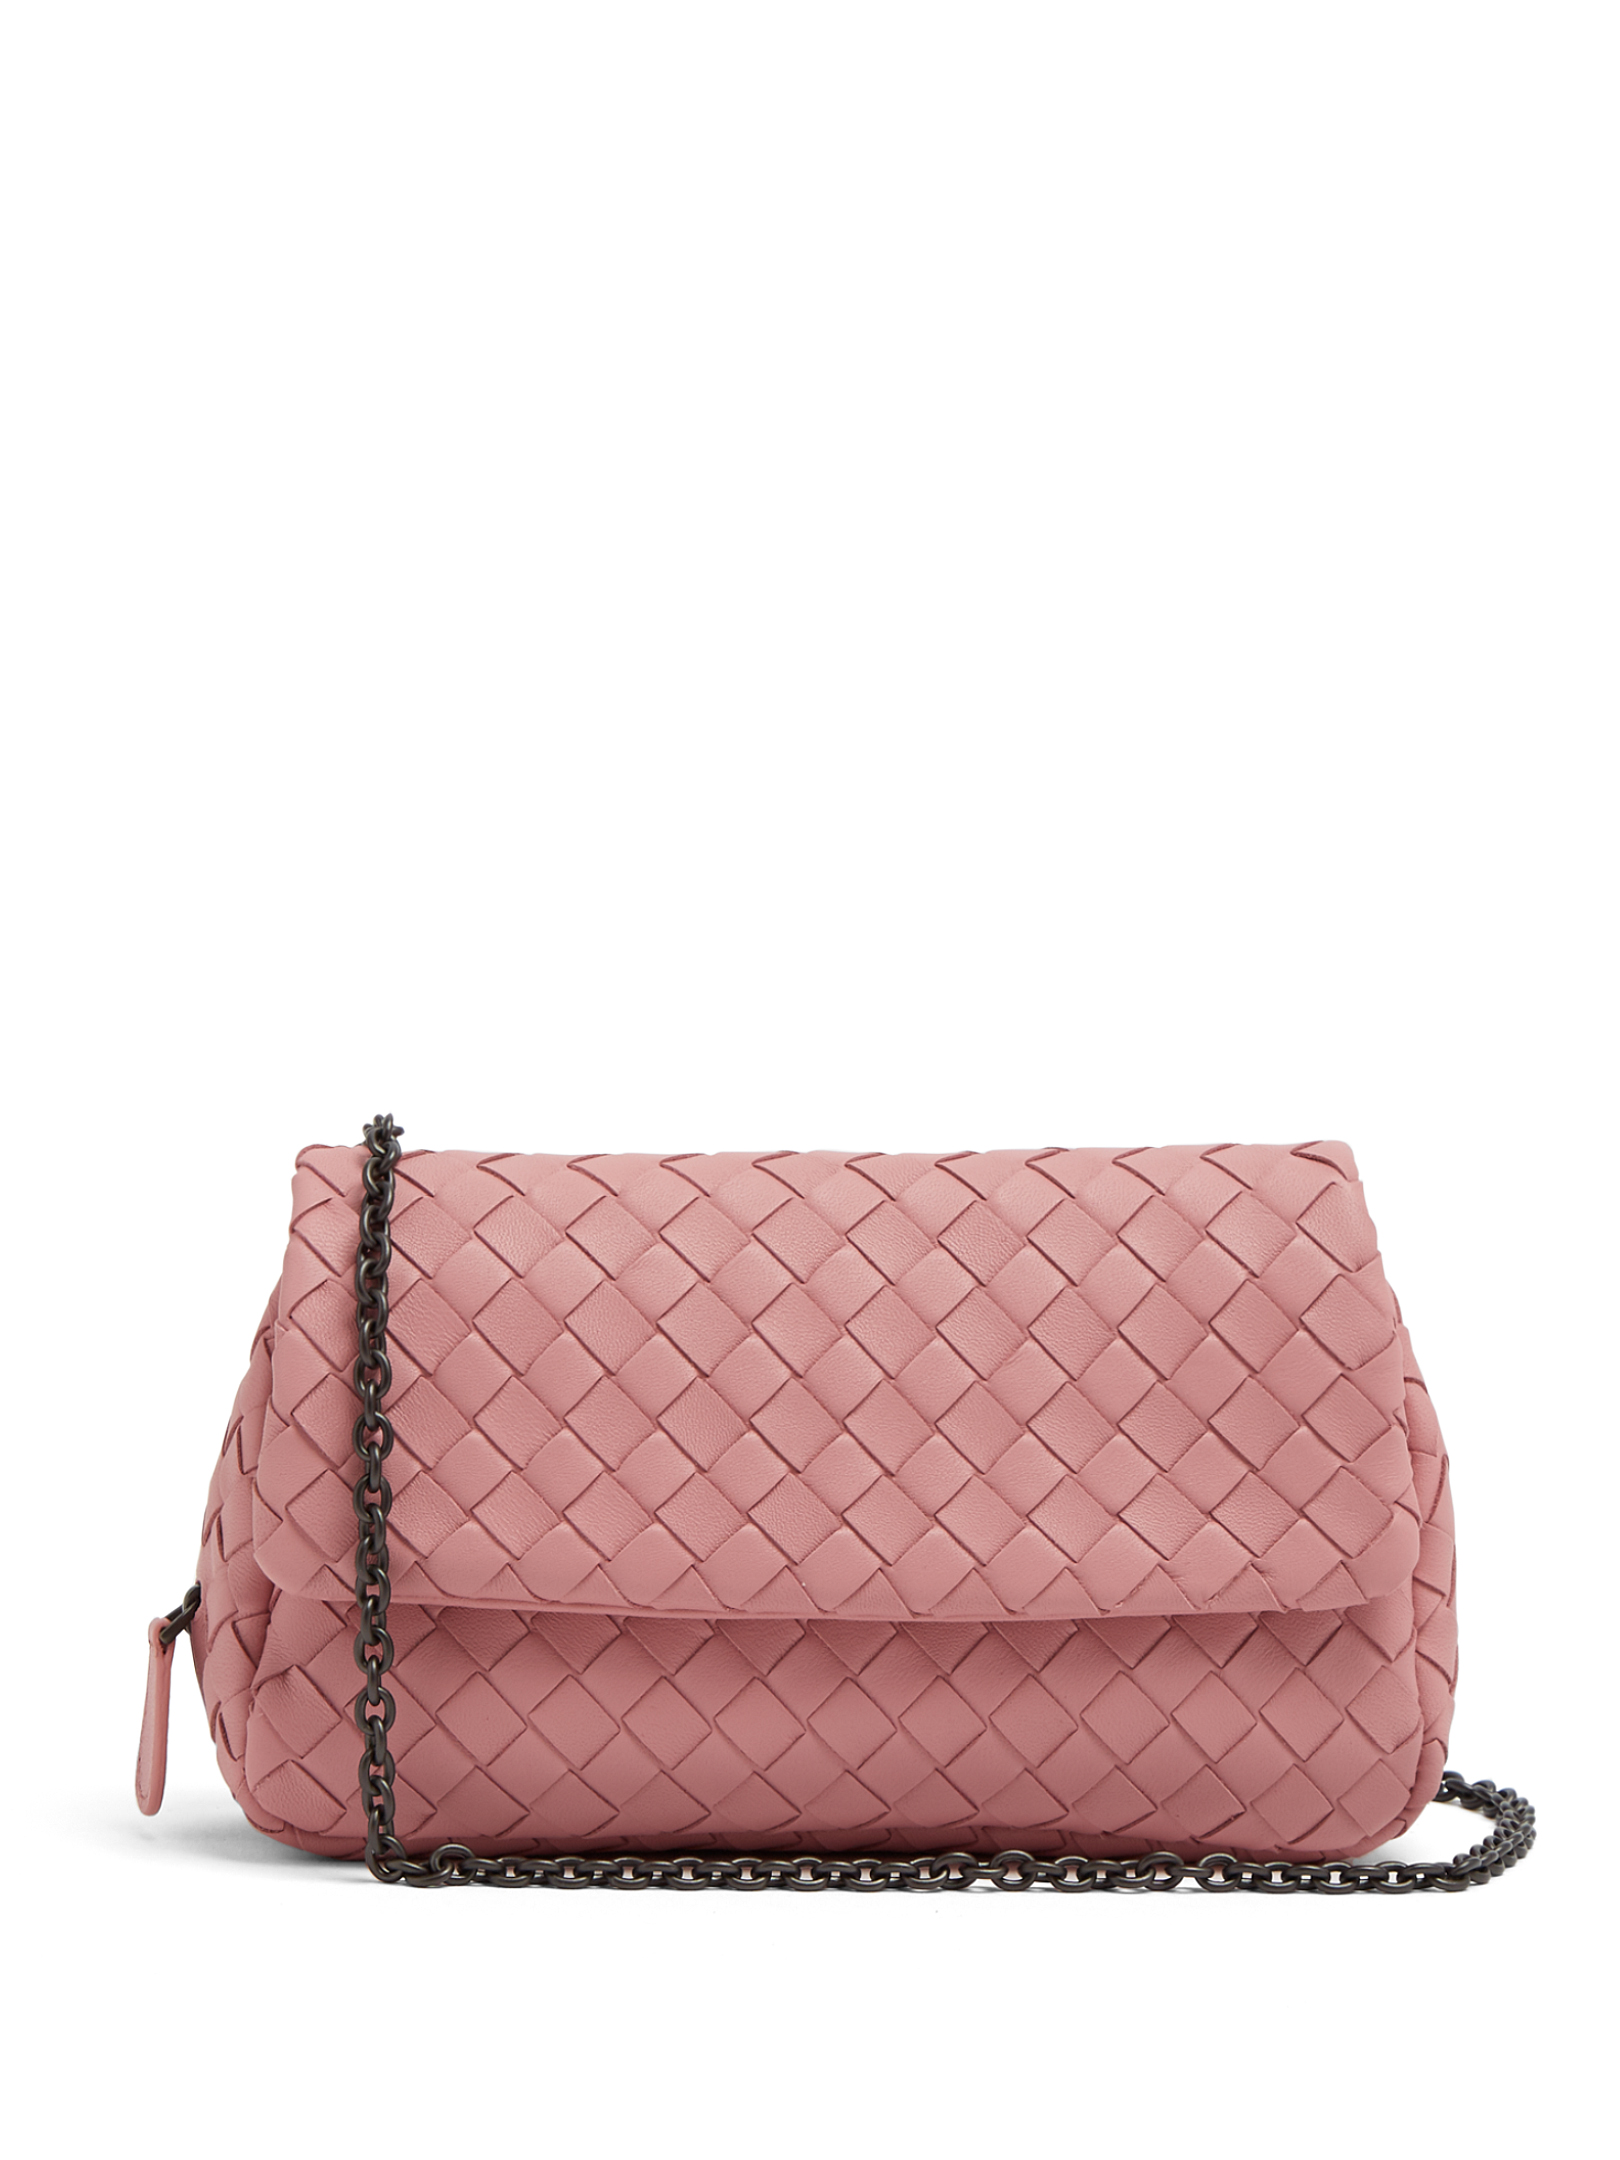 88666c84ff73 Bottega Veneta - Intrecciato Mini Leather Cross-Body Bag